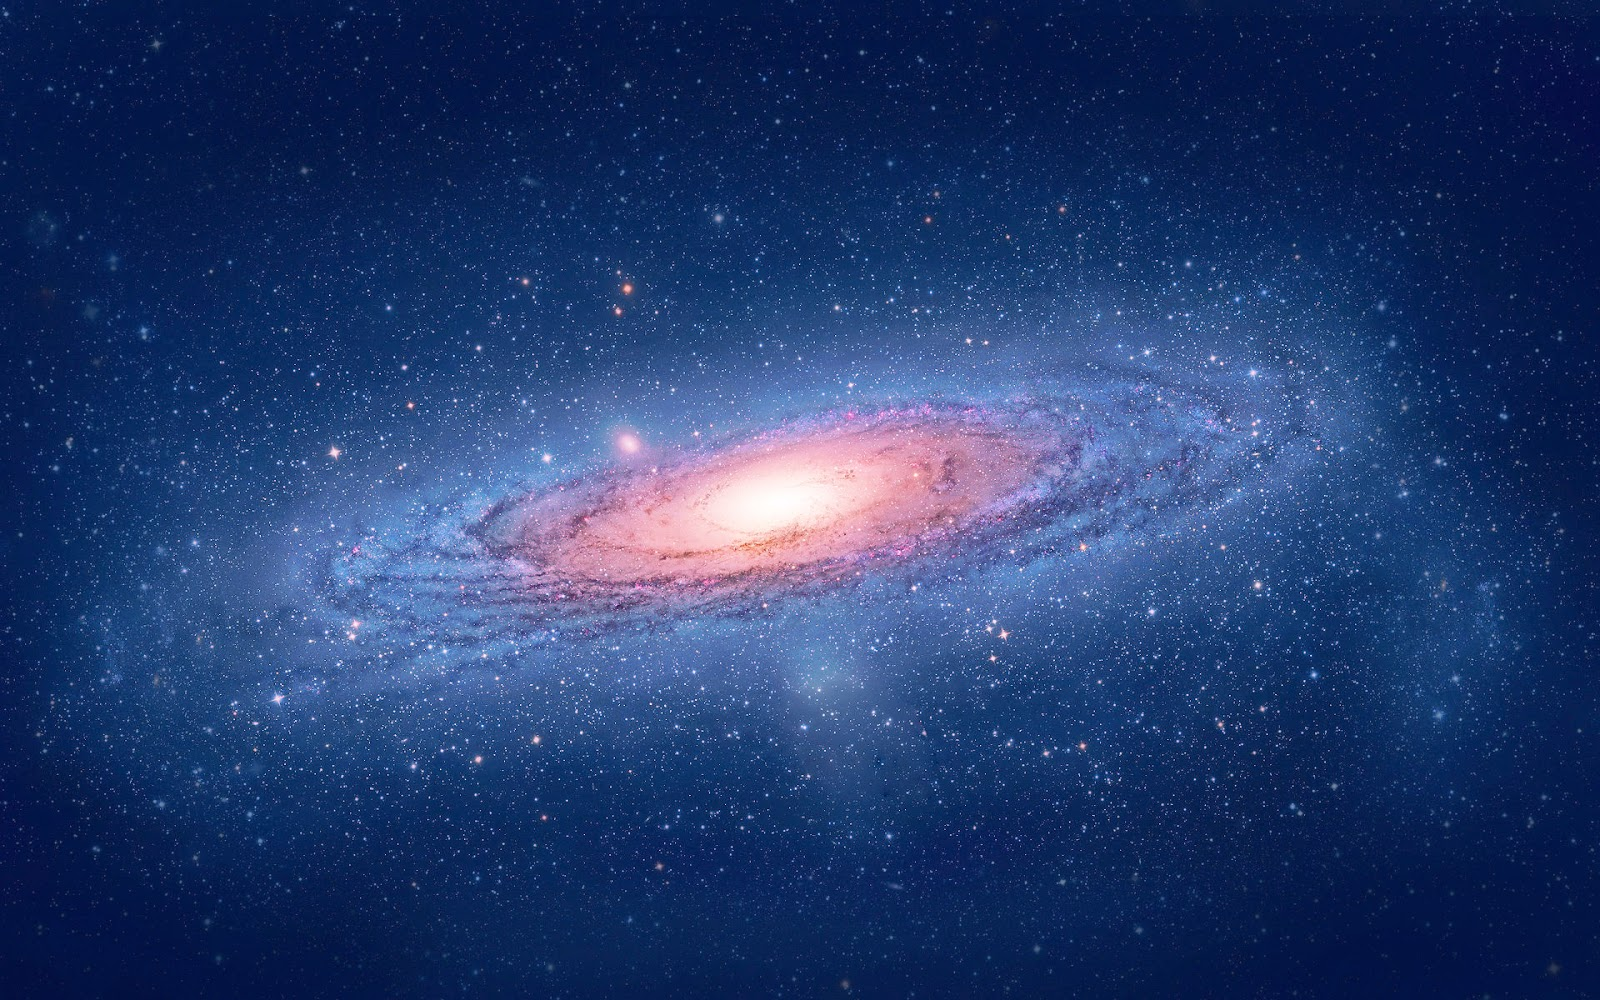 mac-os-x-lion-galaxy-stars-hd-wallpaper-1920x1200-1080p-original-desktop-background-apple-www.epichdwallpapers.com